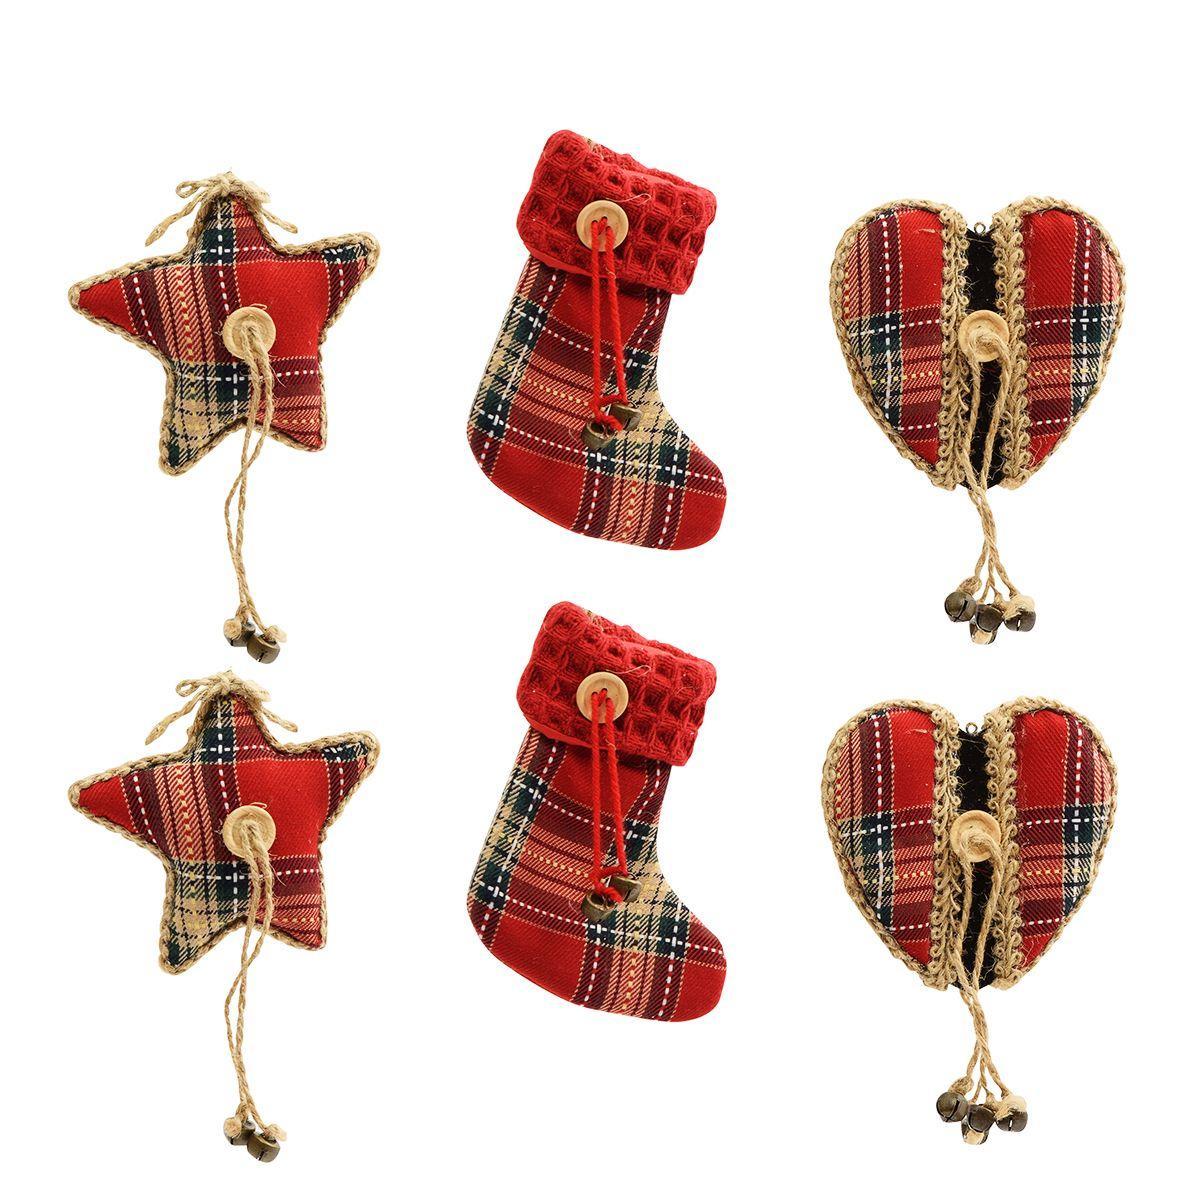 Игрушки в виде звезд, сердец и рождественских носков, 6 шт.